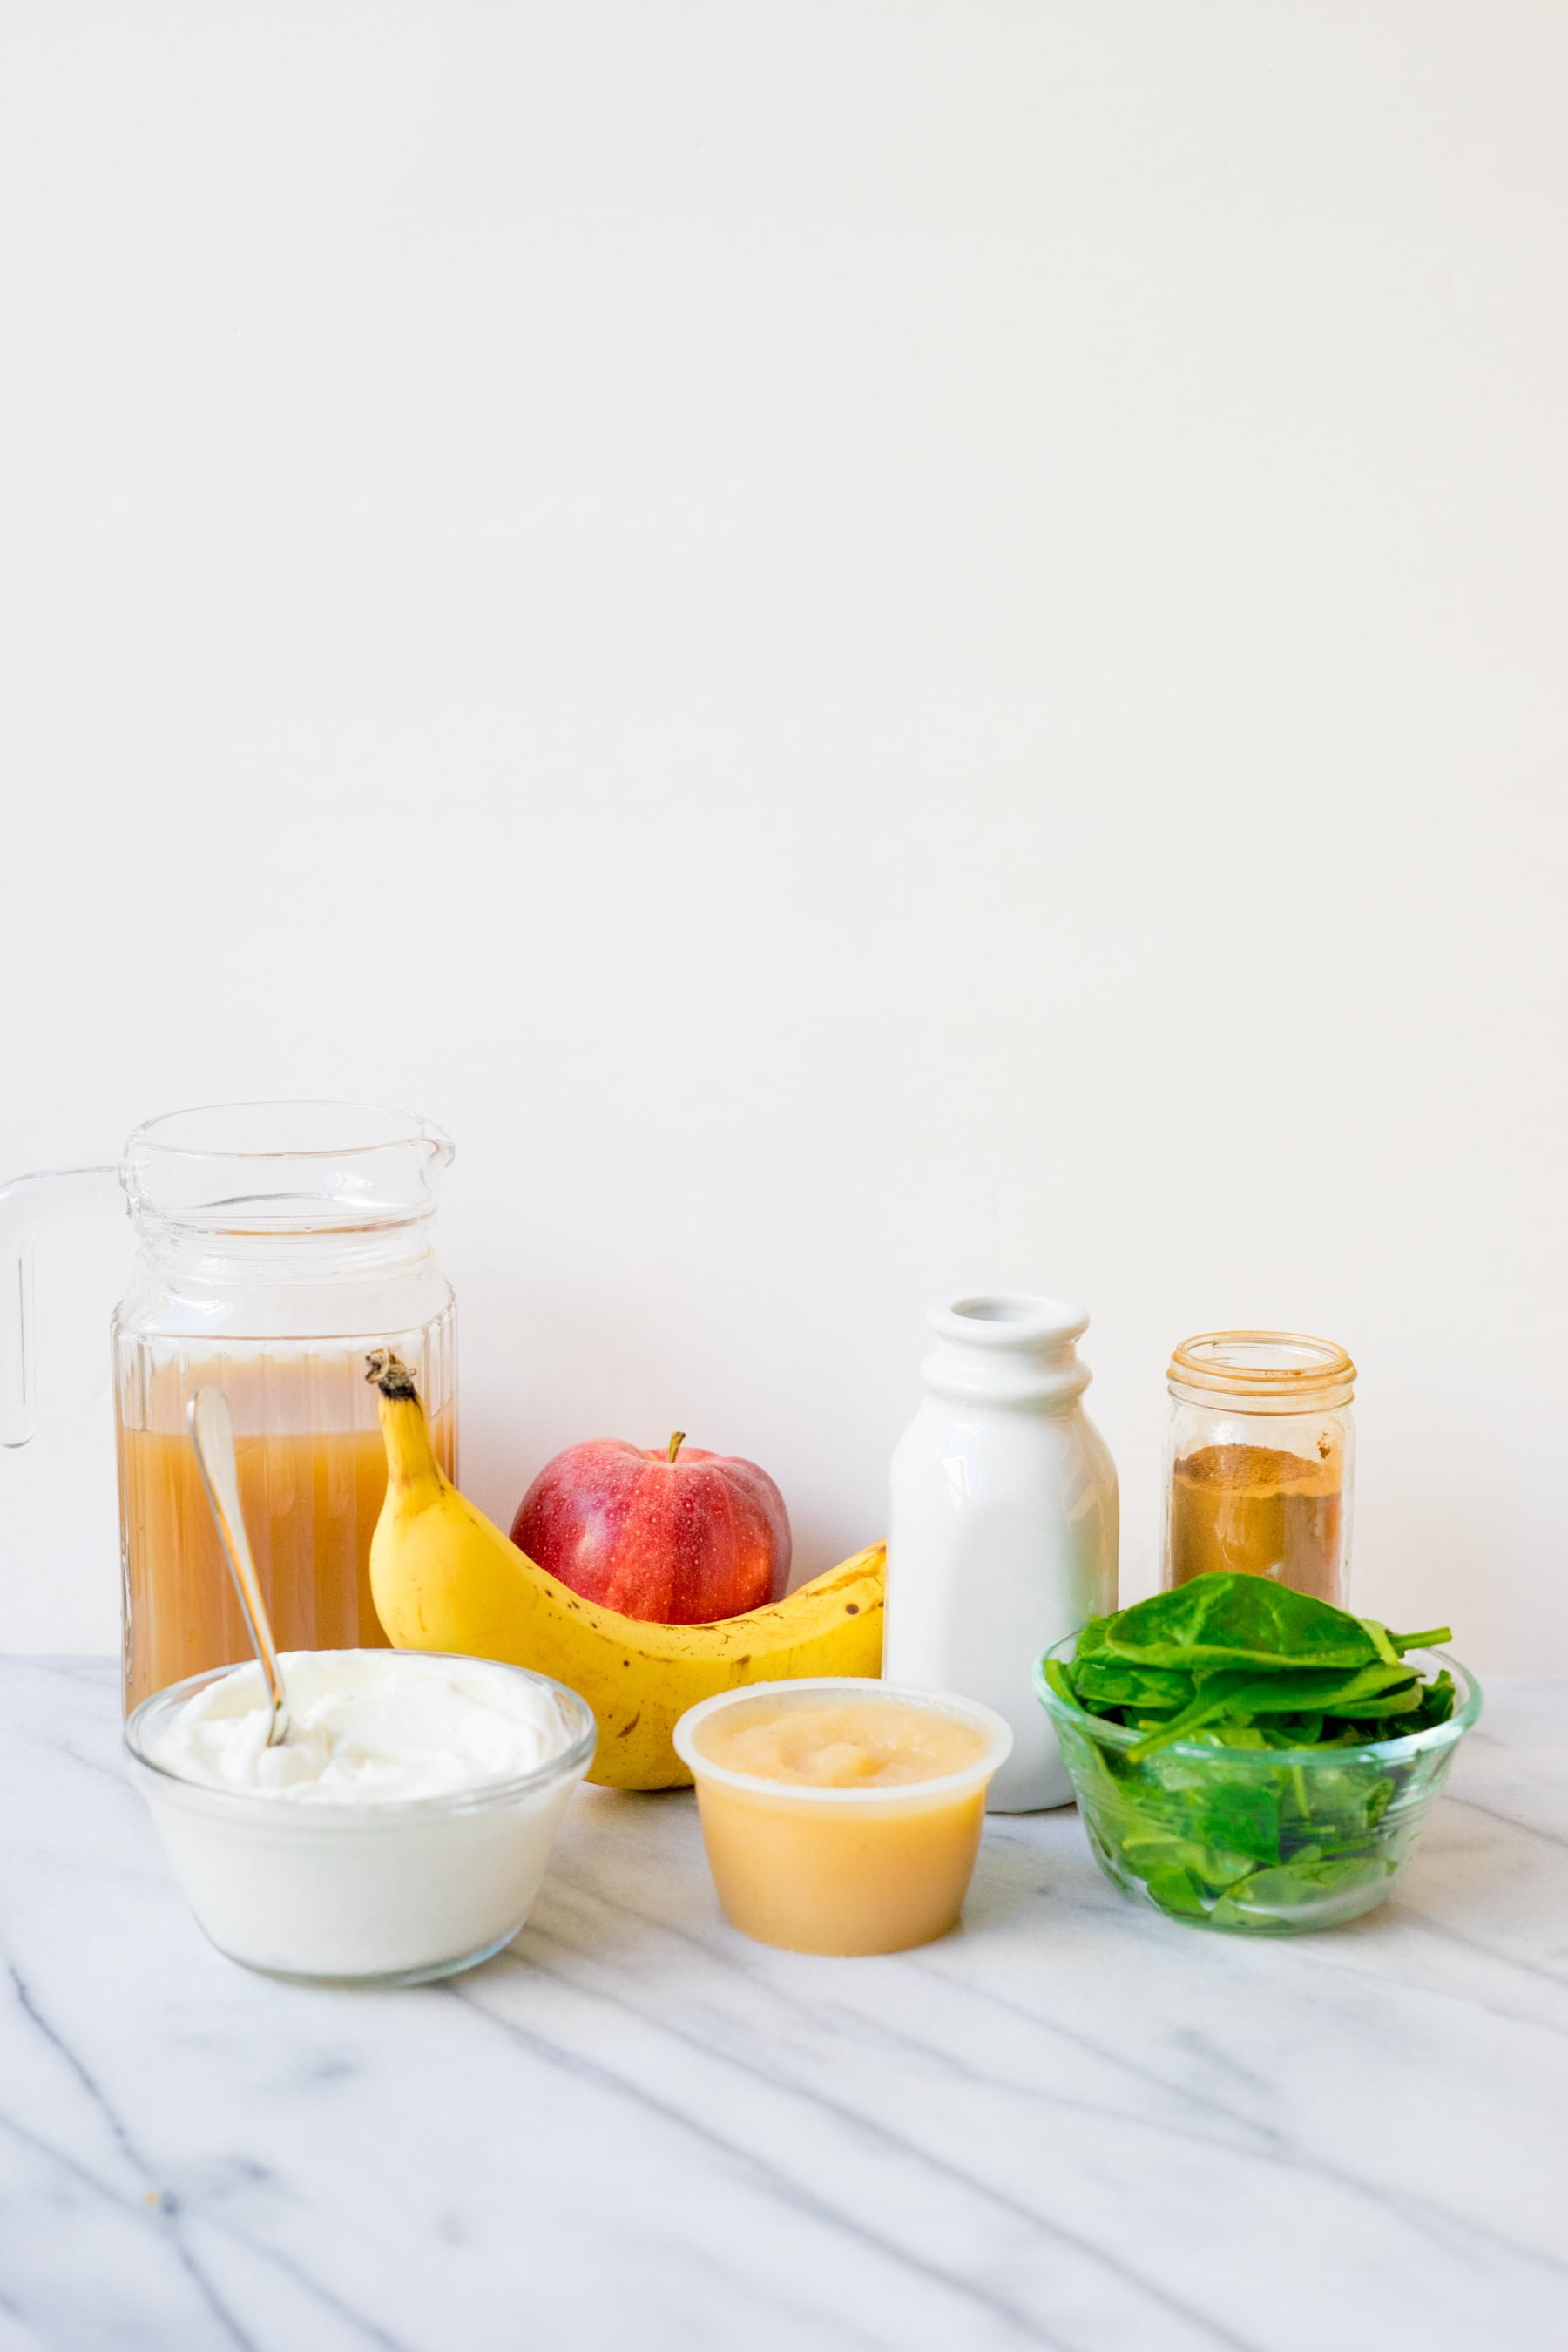 Apple cider, banana, milk, yogurt, spinach, applesauce, cinnamon arranged on kitchen counter